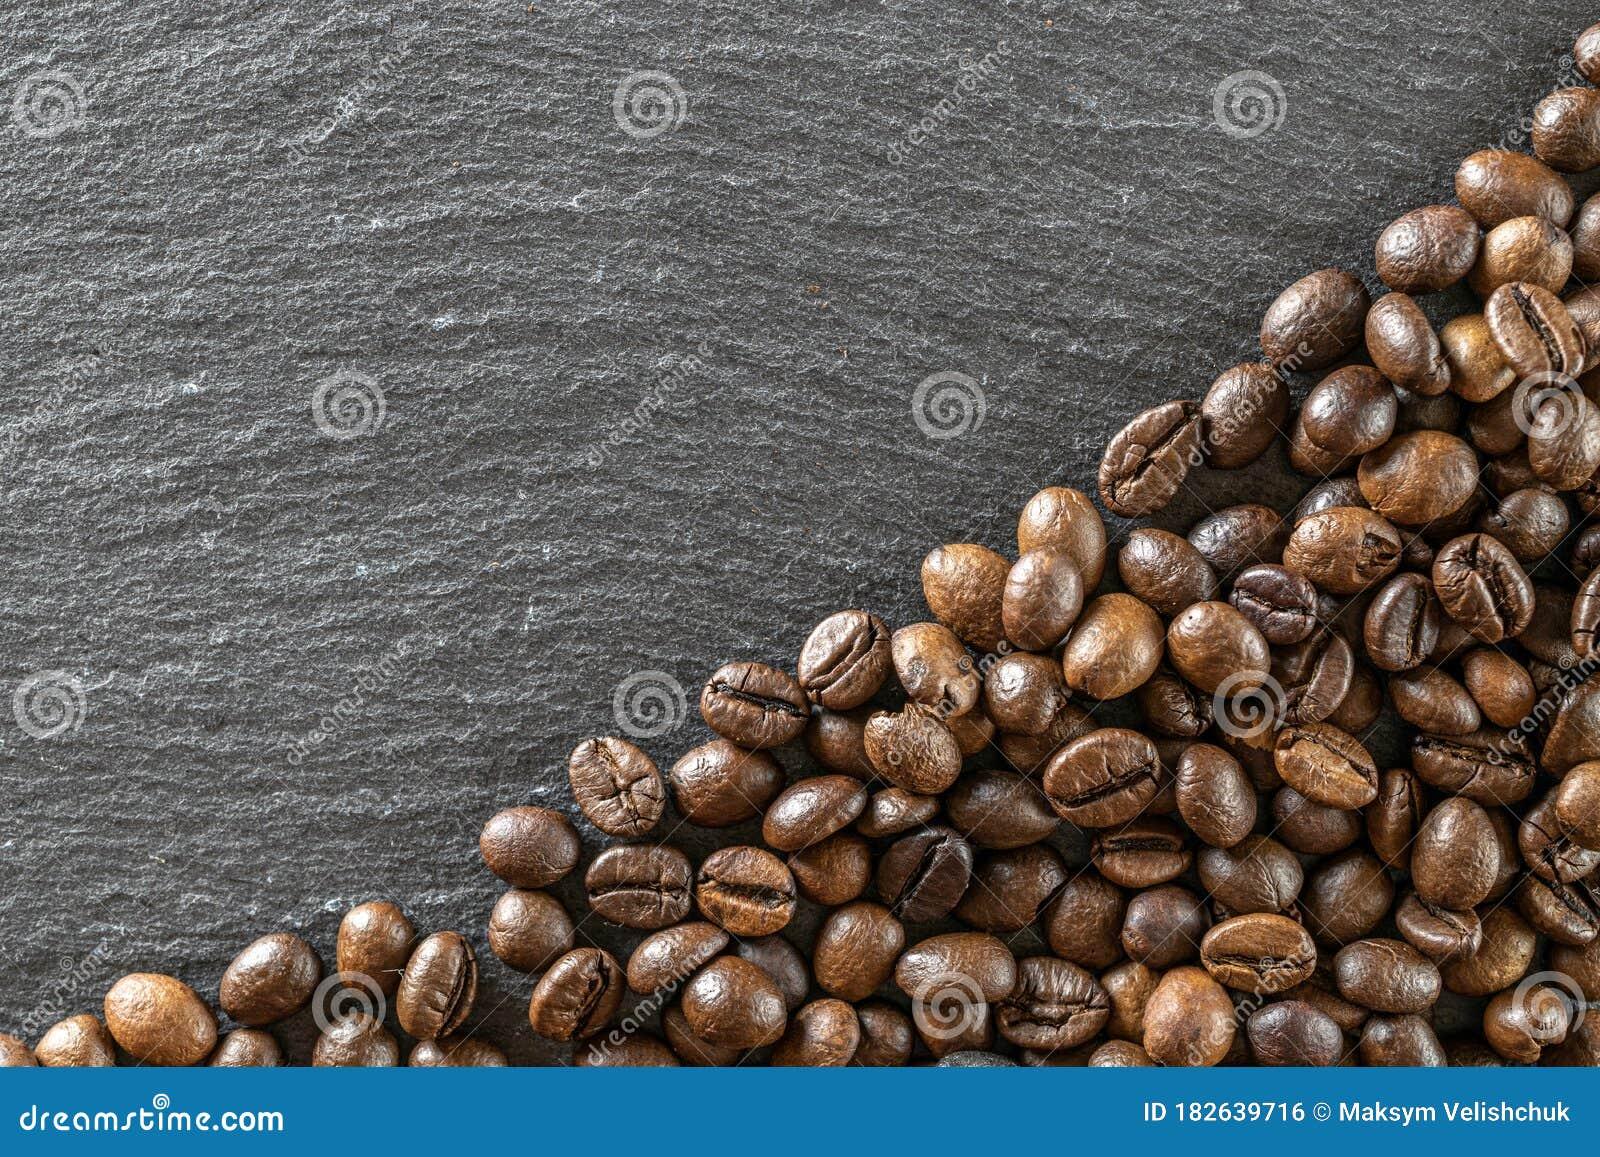 Food, Drink Caffeine Background. Dark Coffee Beans For Cup ...